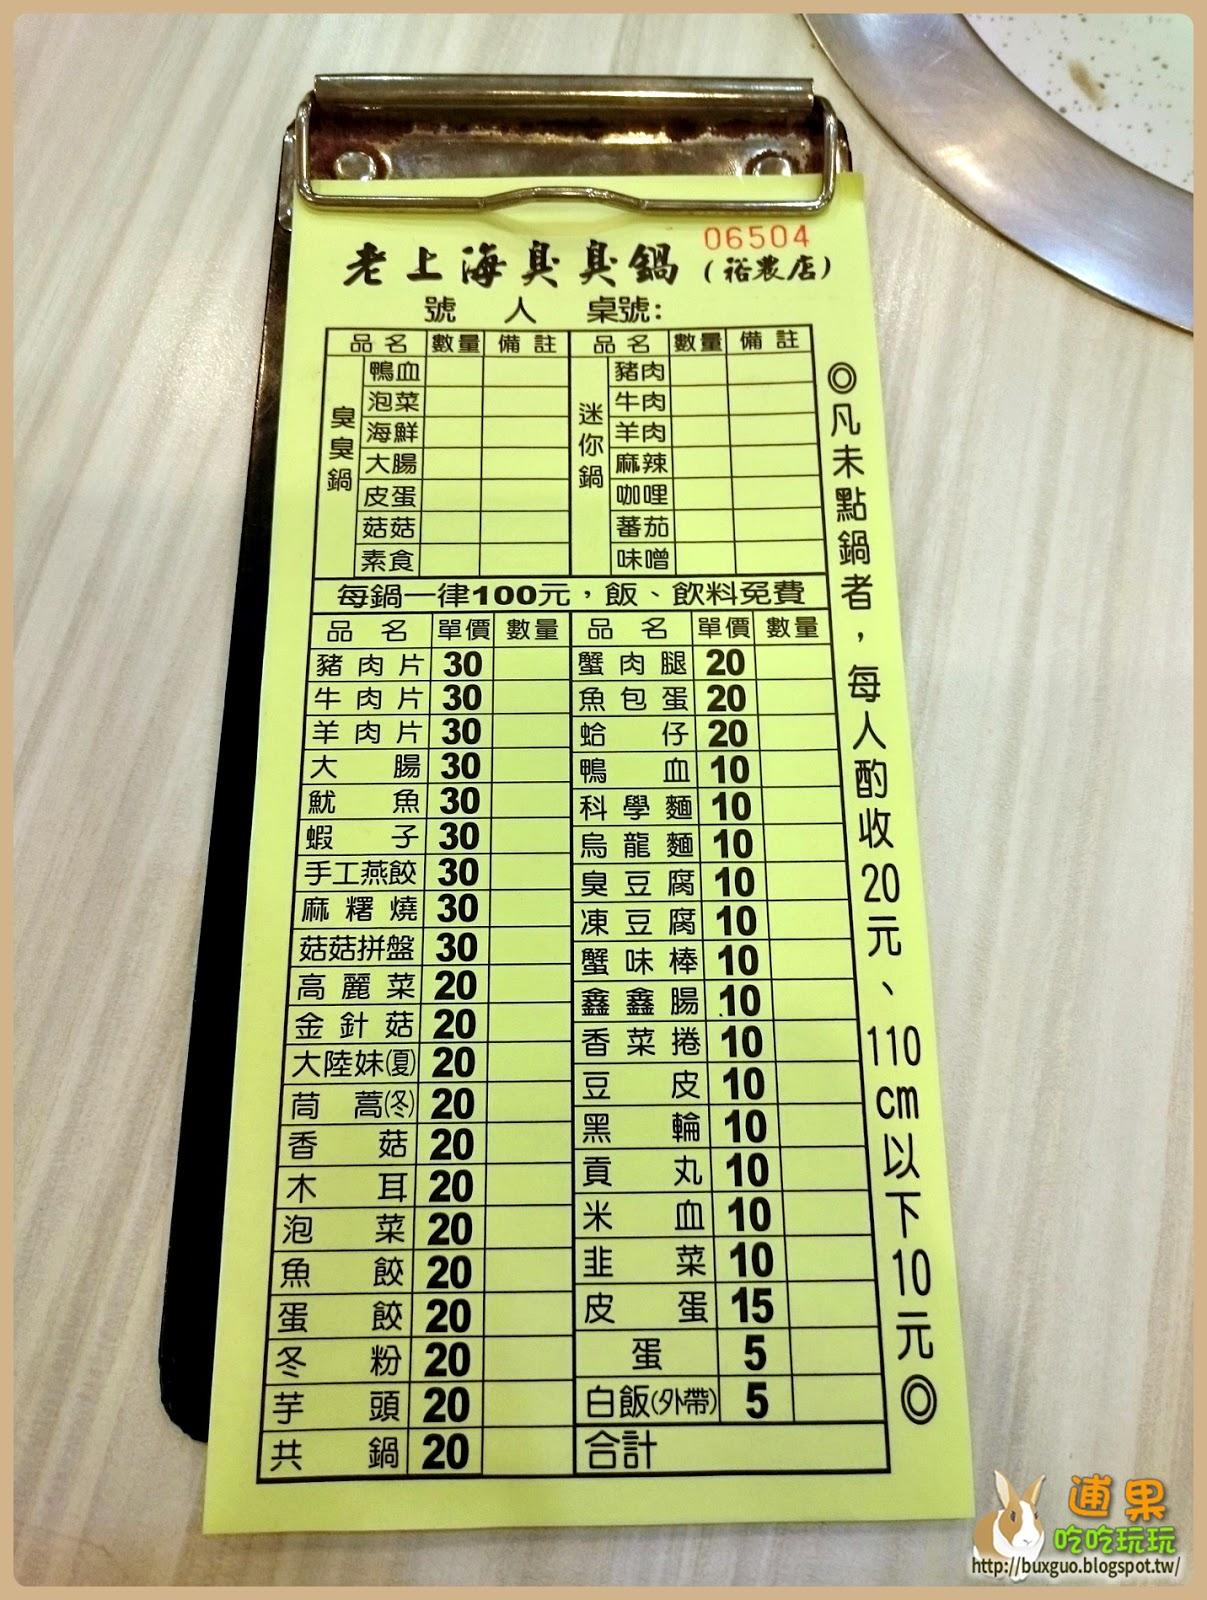 R人吃吃玩玩: 老上海臭臭鍋 (裕農店)